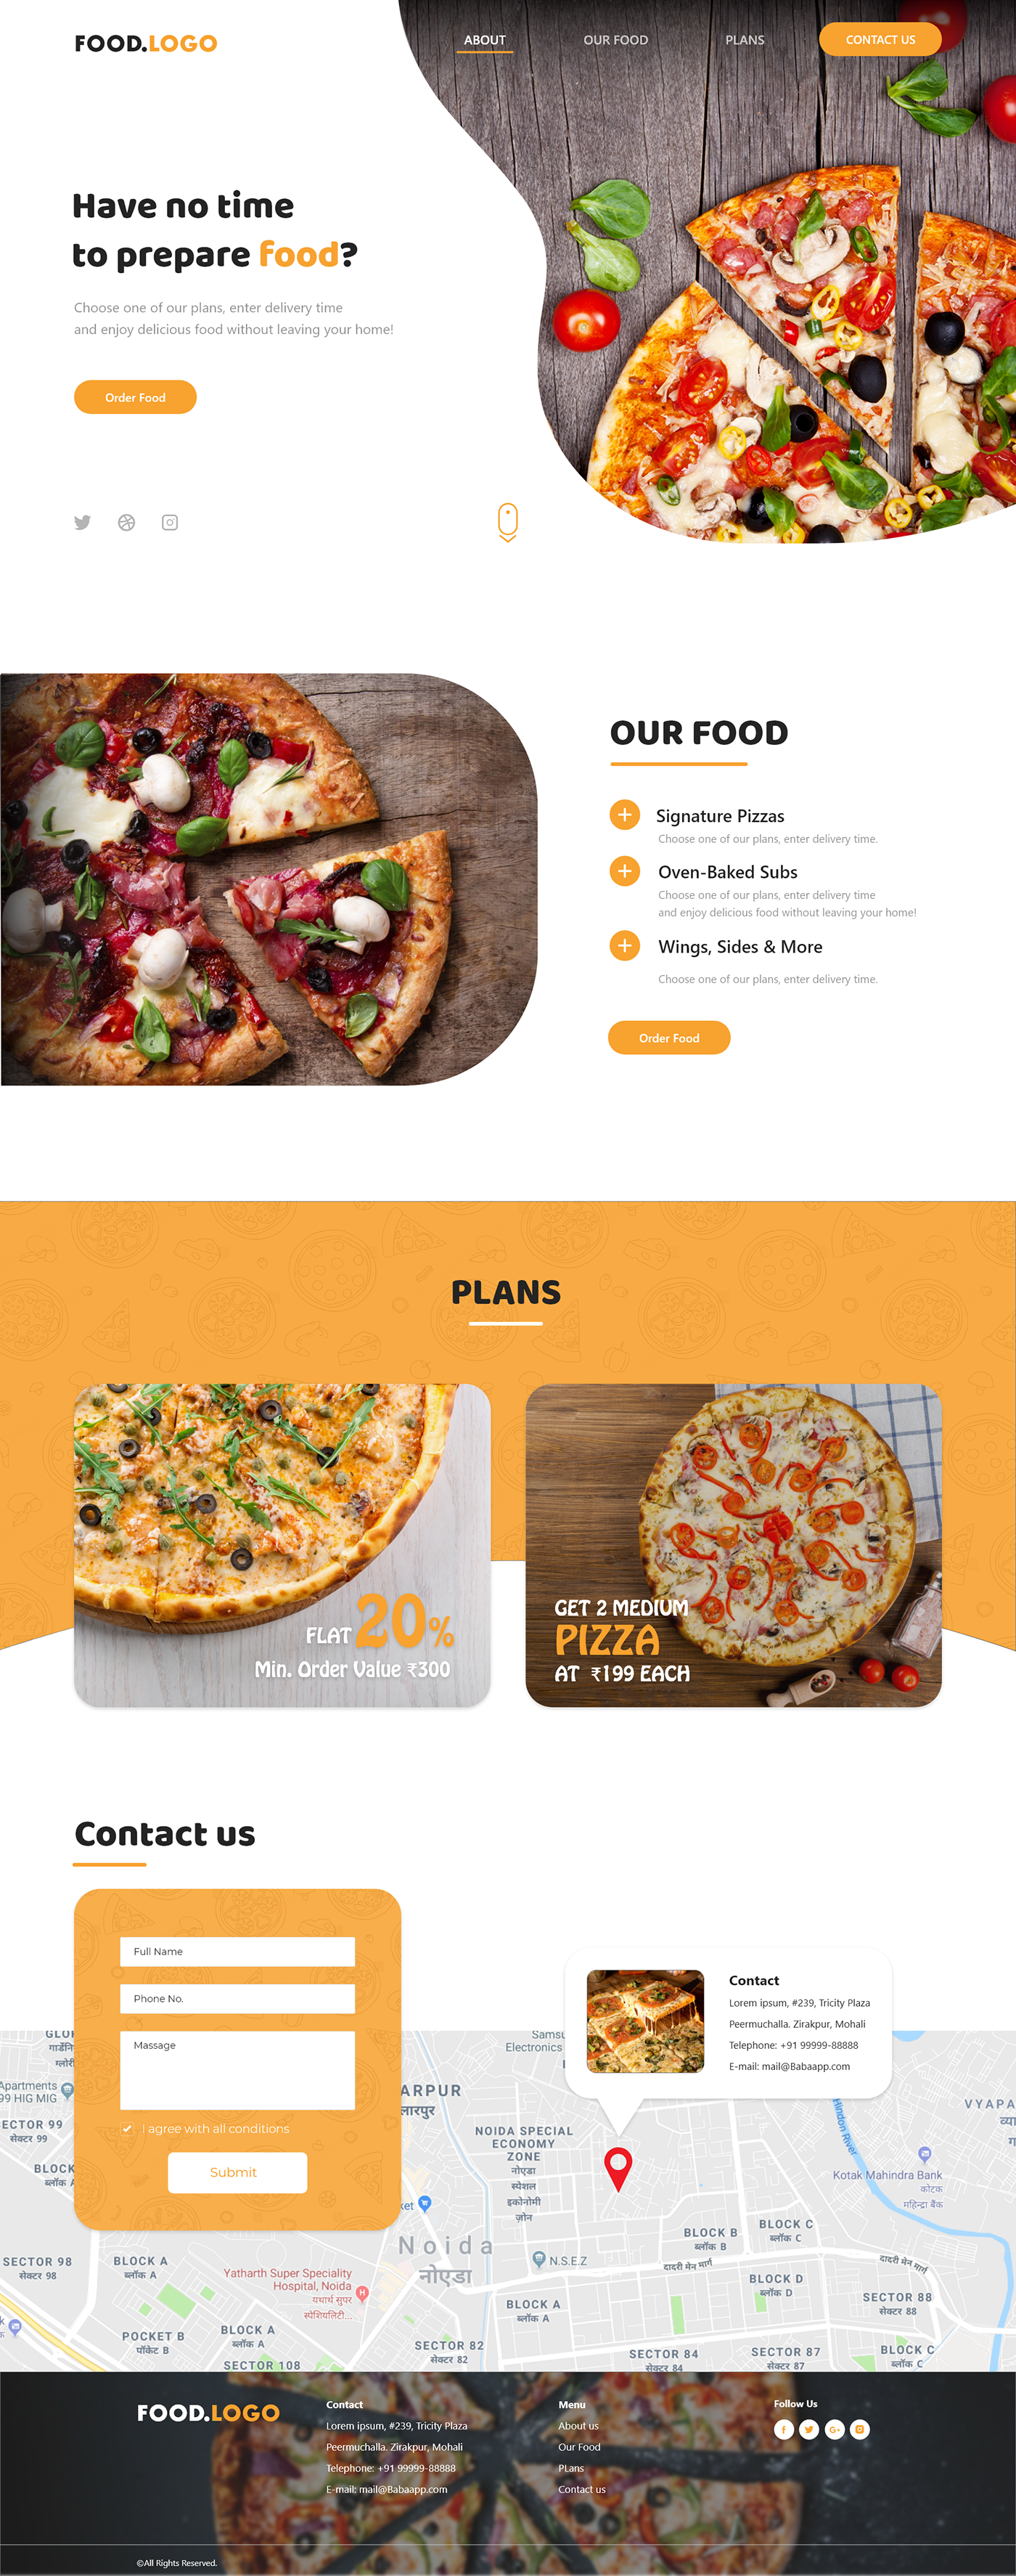 xd file free file food website free adobe xd file free food website